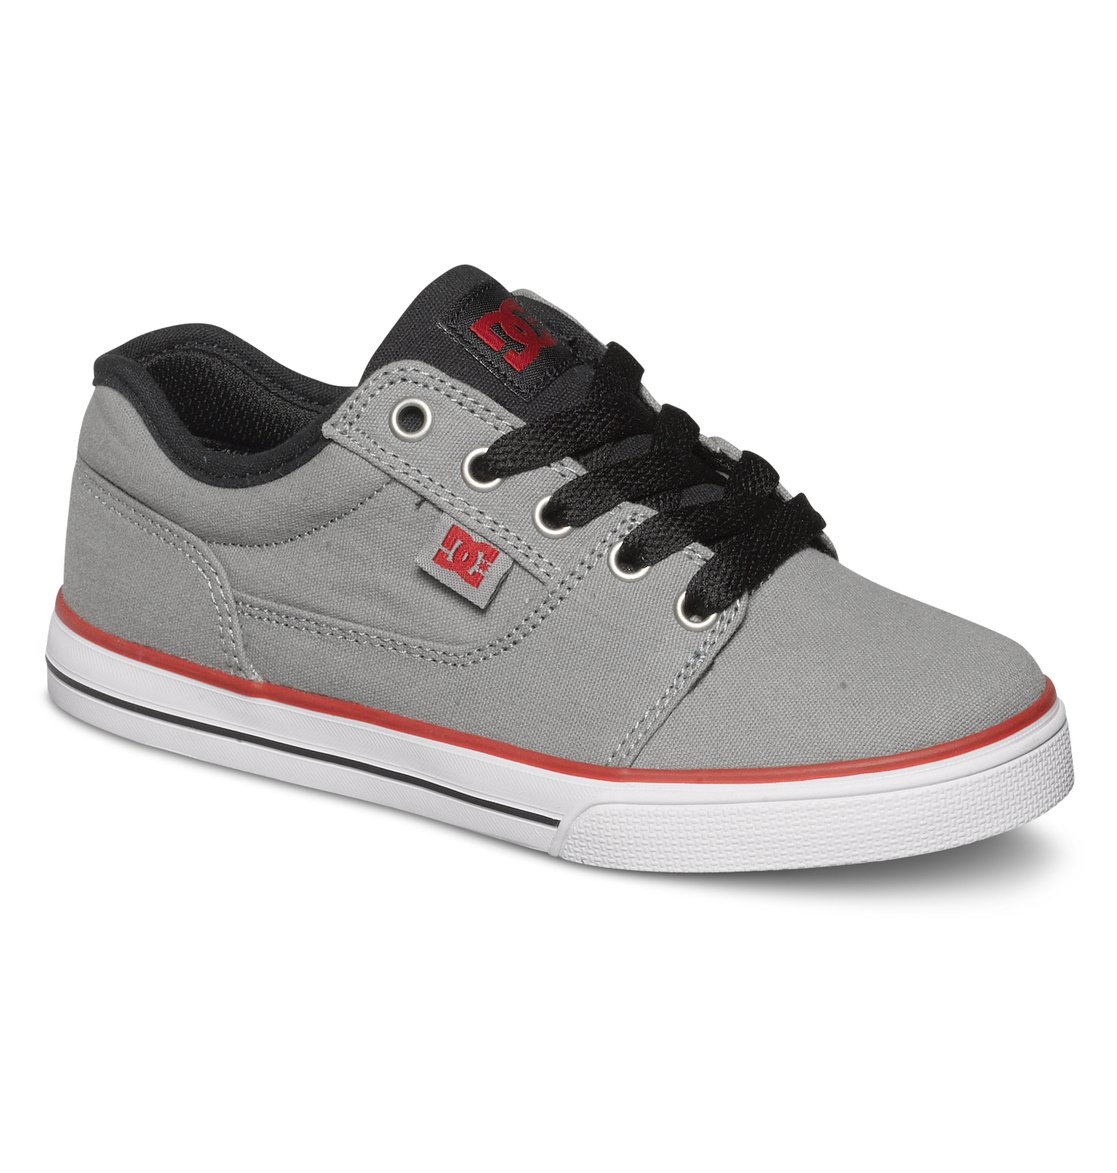 Dc Tonik Shoes Uk